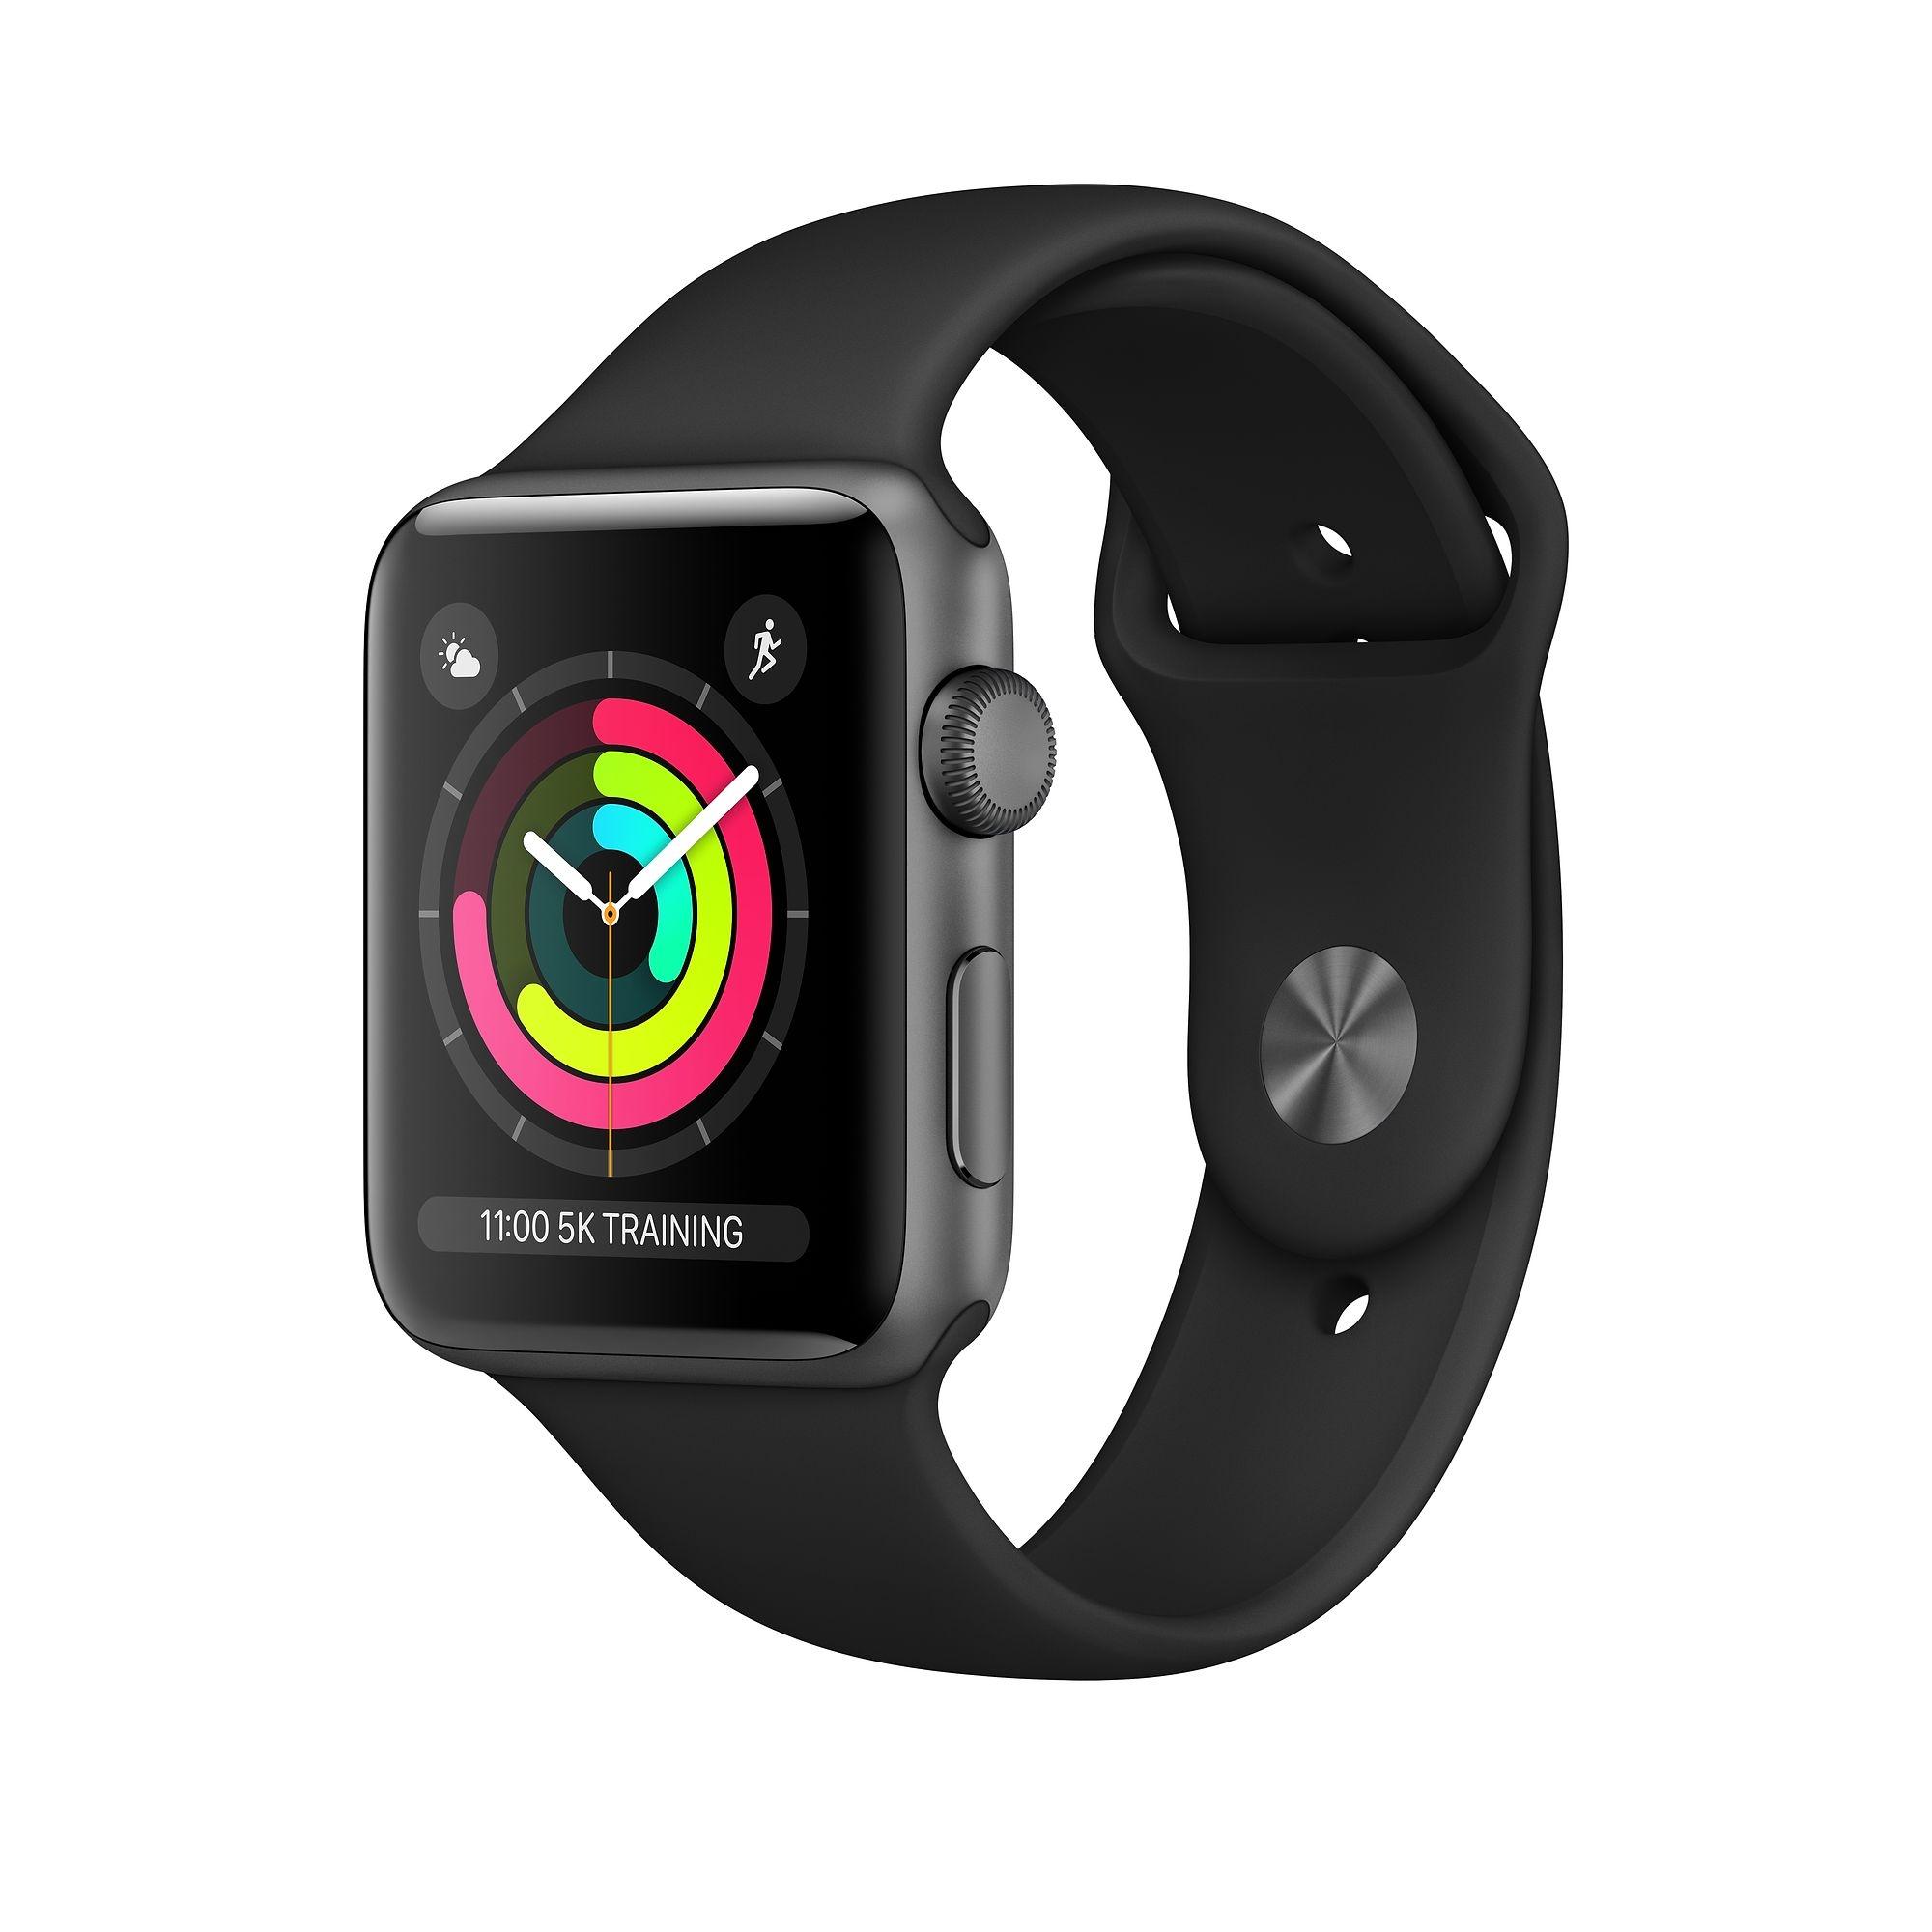 ساعت هوشمند اپل واچ سری 3 - 42mm